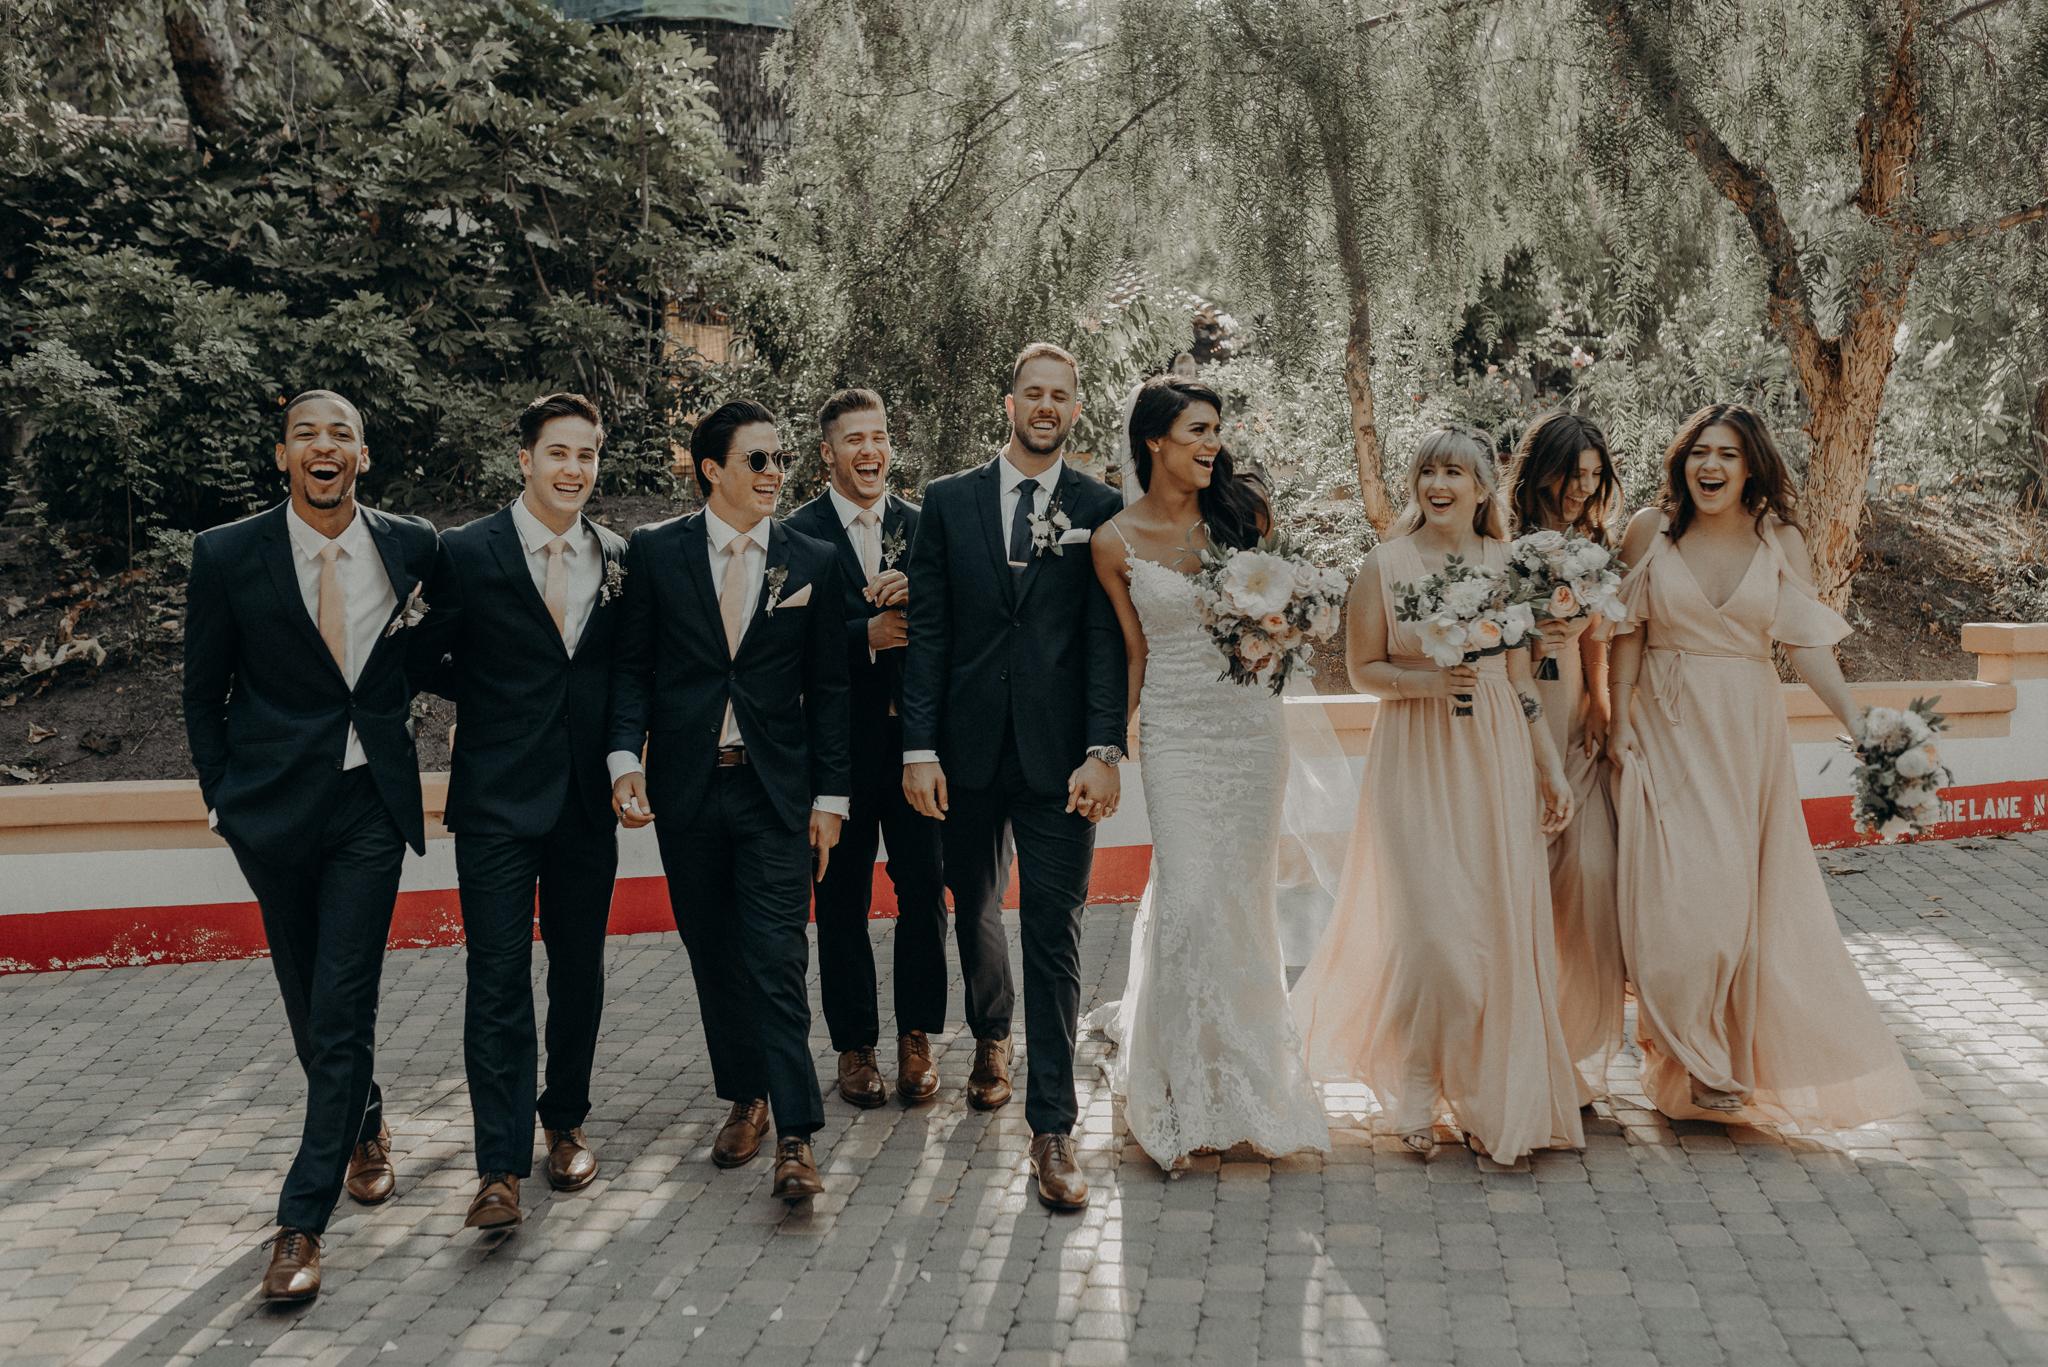 Isaiah + Taylor Photography - Rancho Las Lomas Wedding, Los Angeles Wedding Photographer-075.jpg